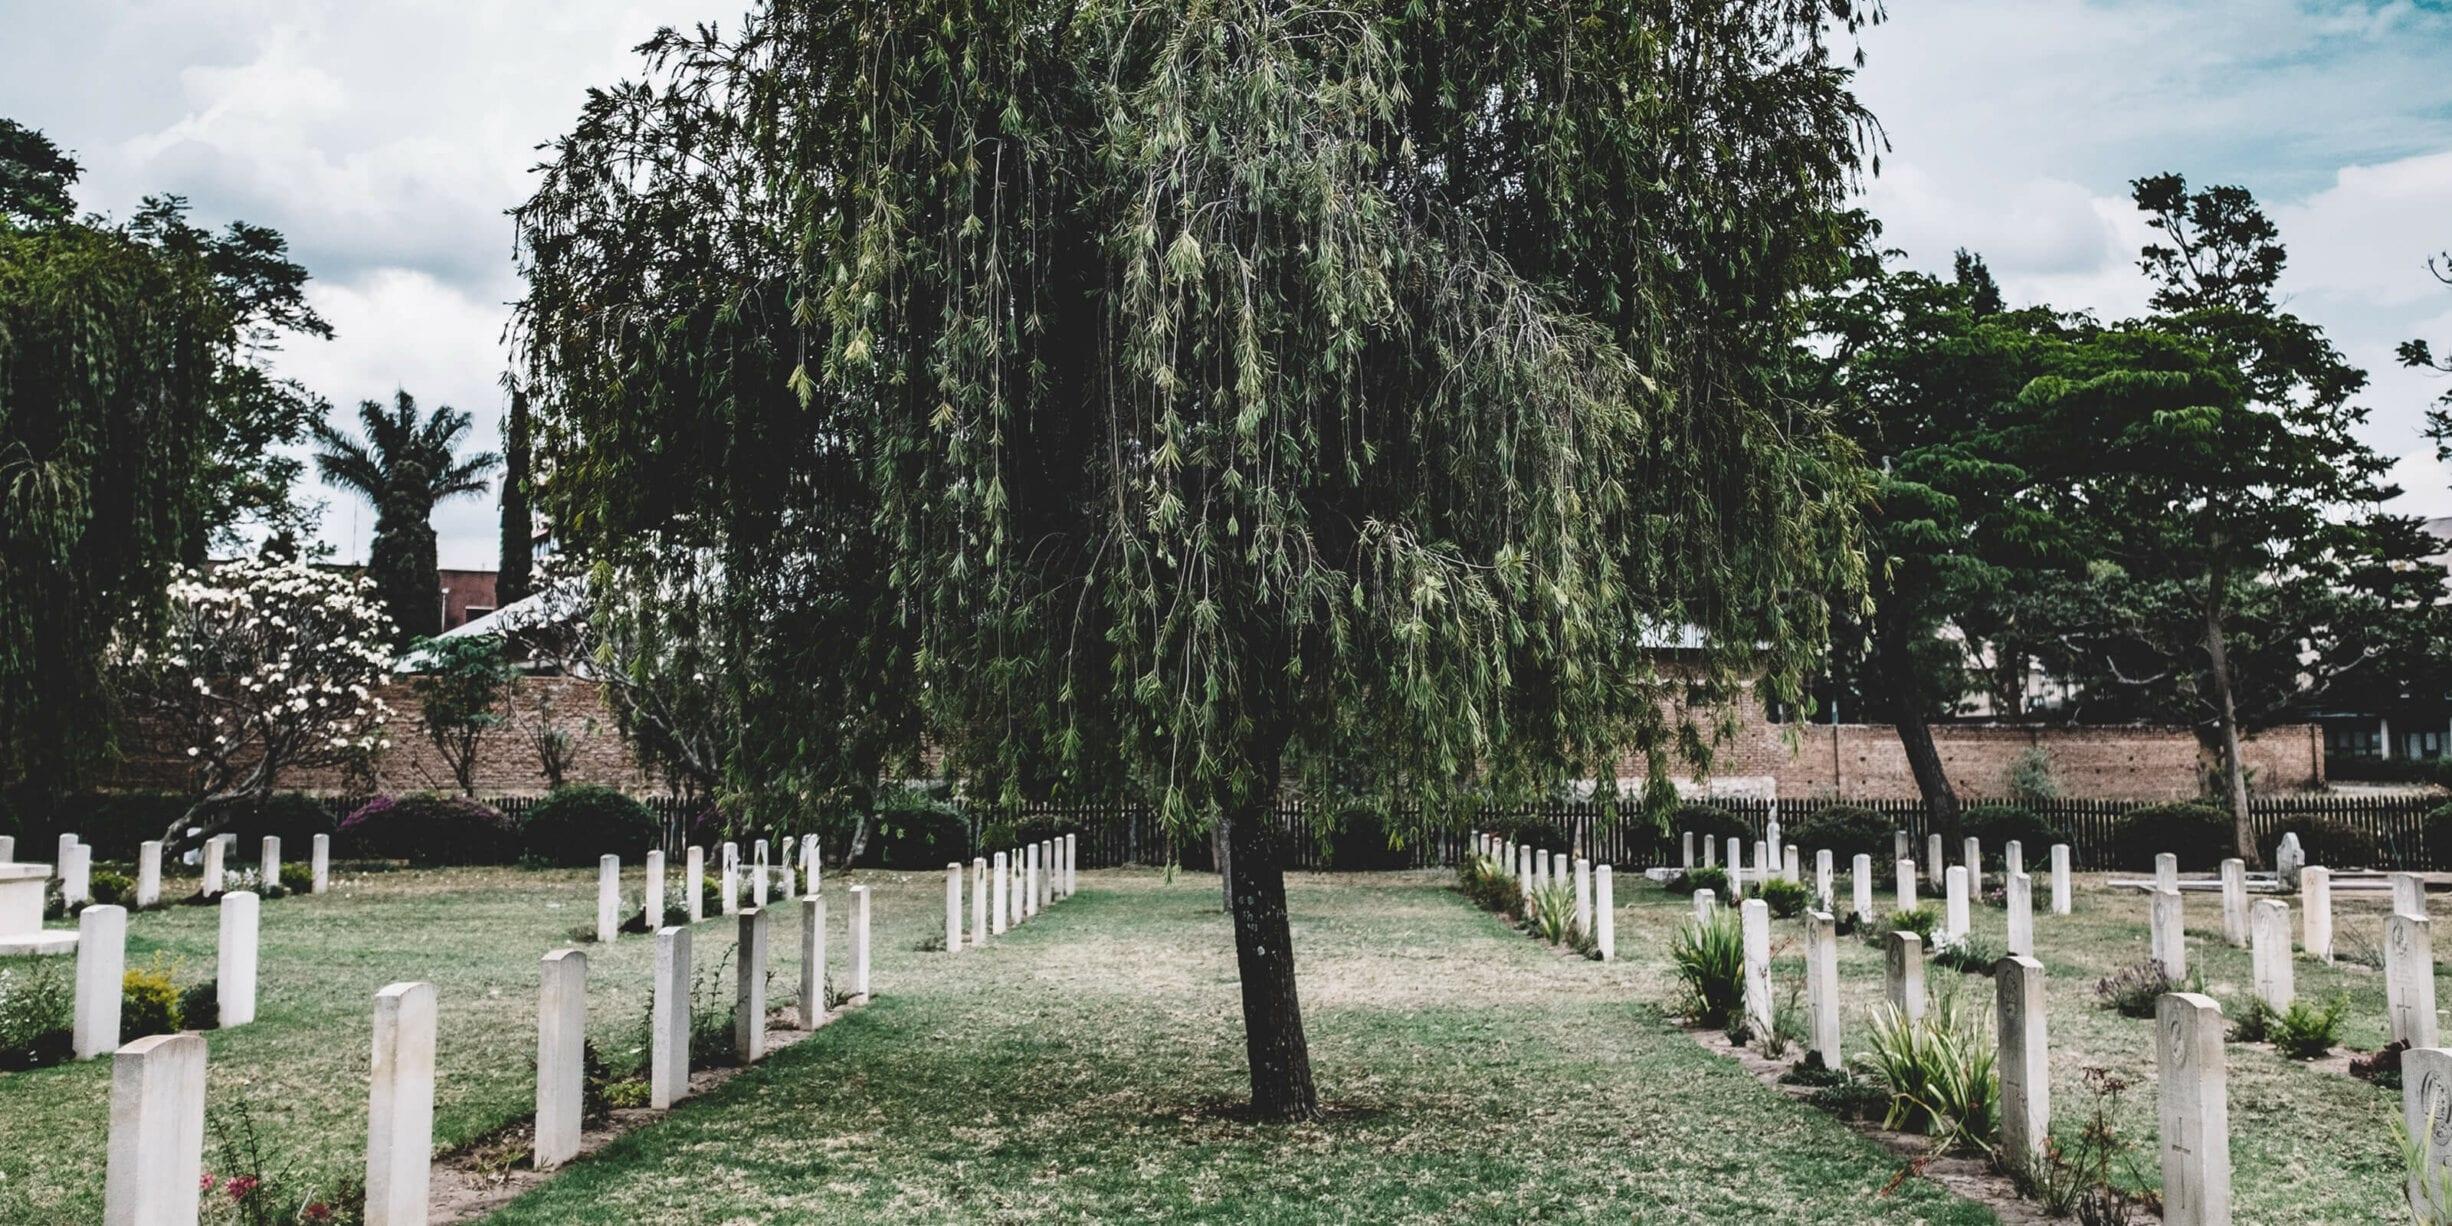 tree between rows of gravestones